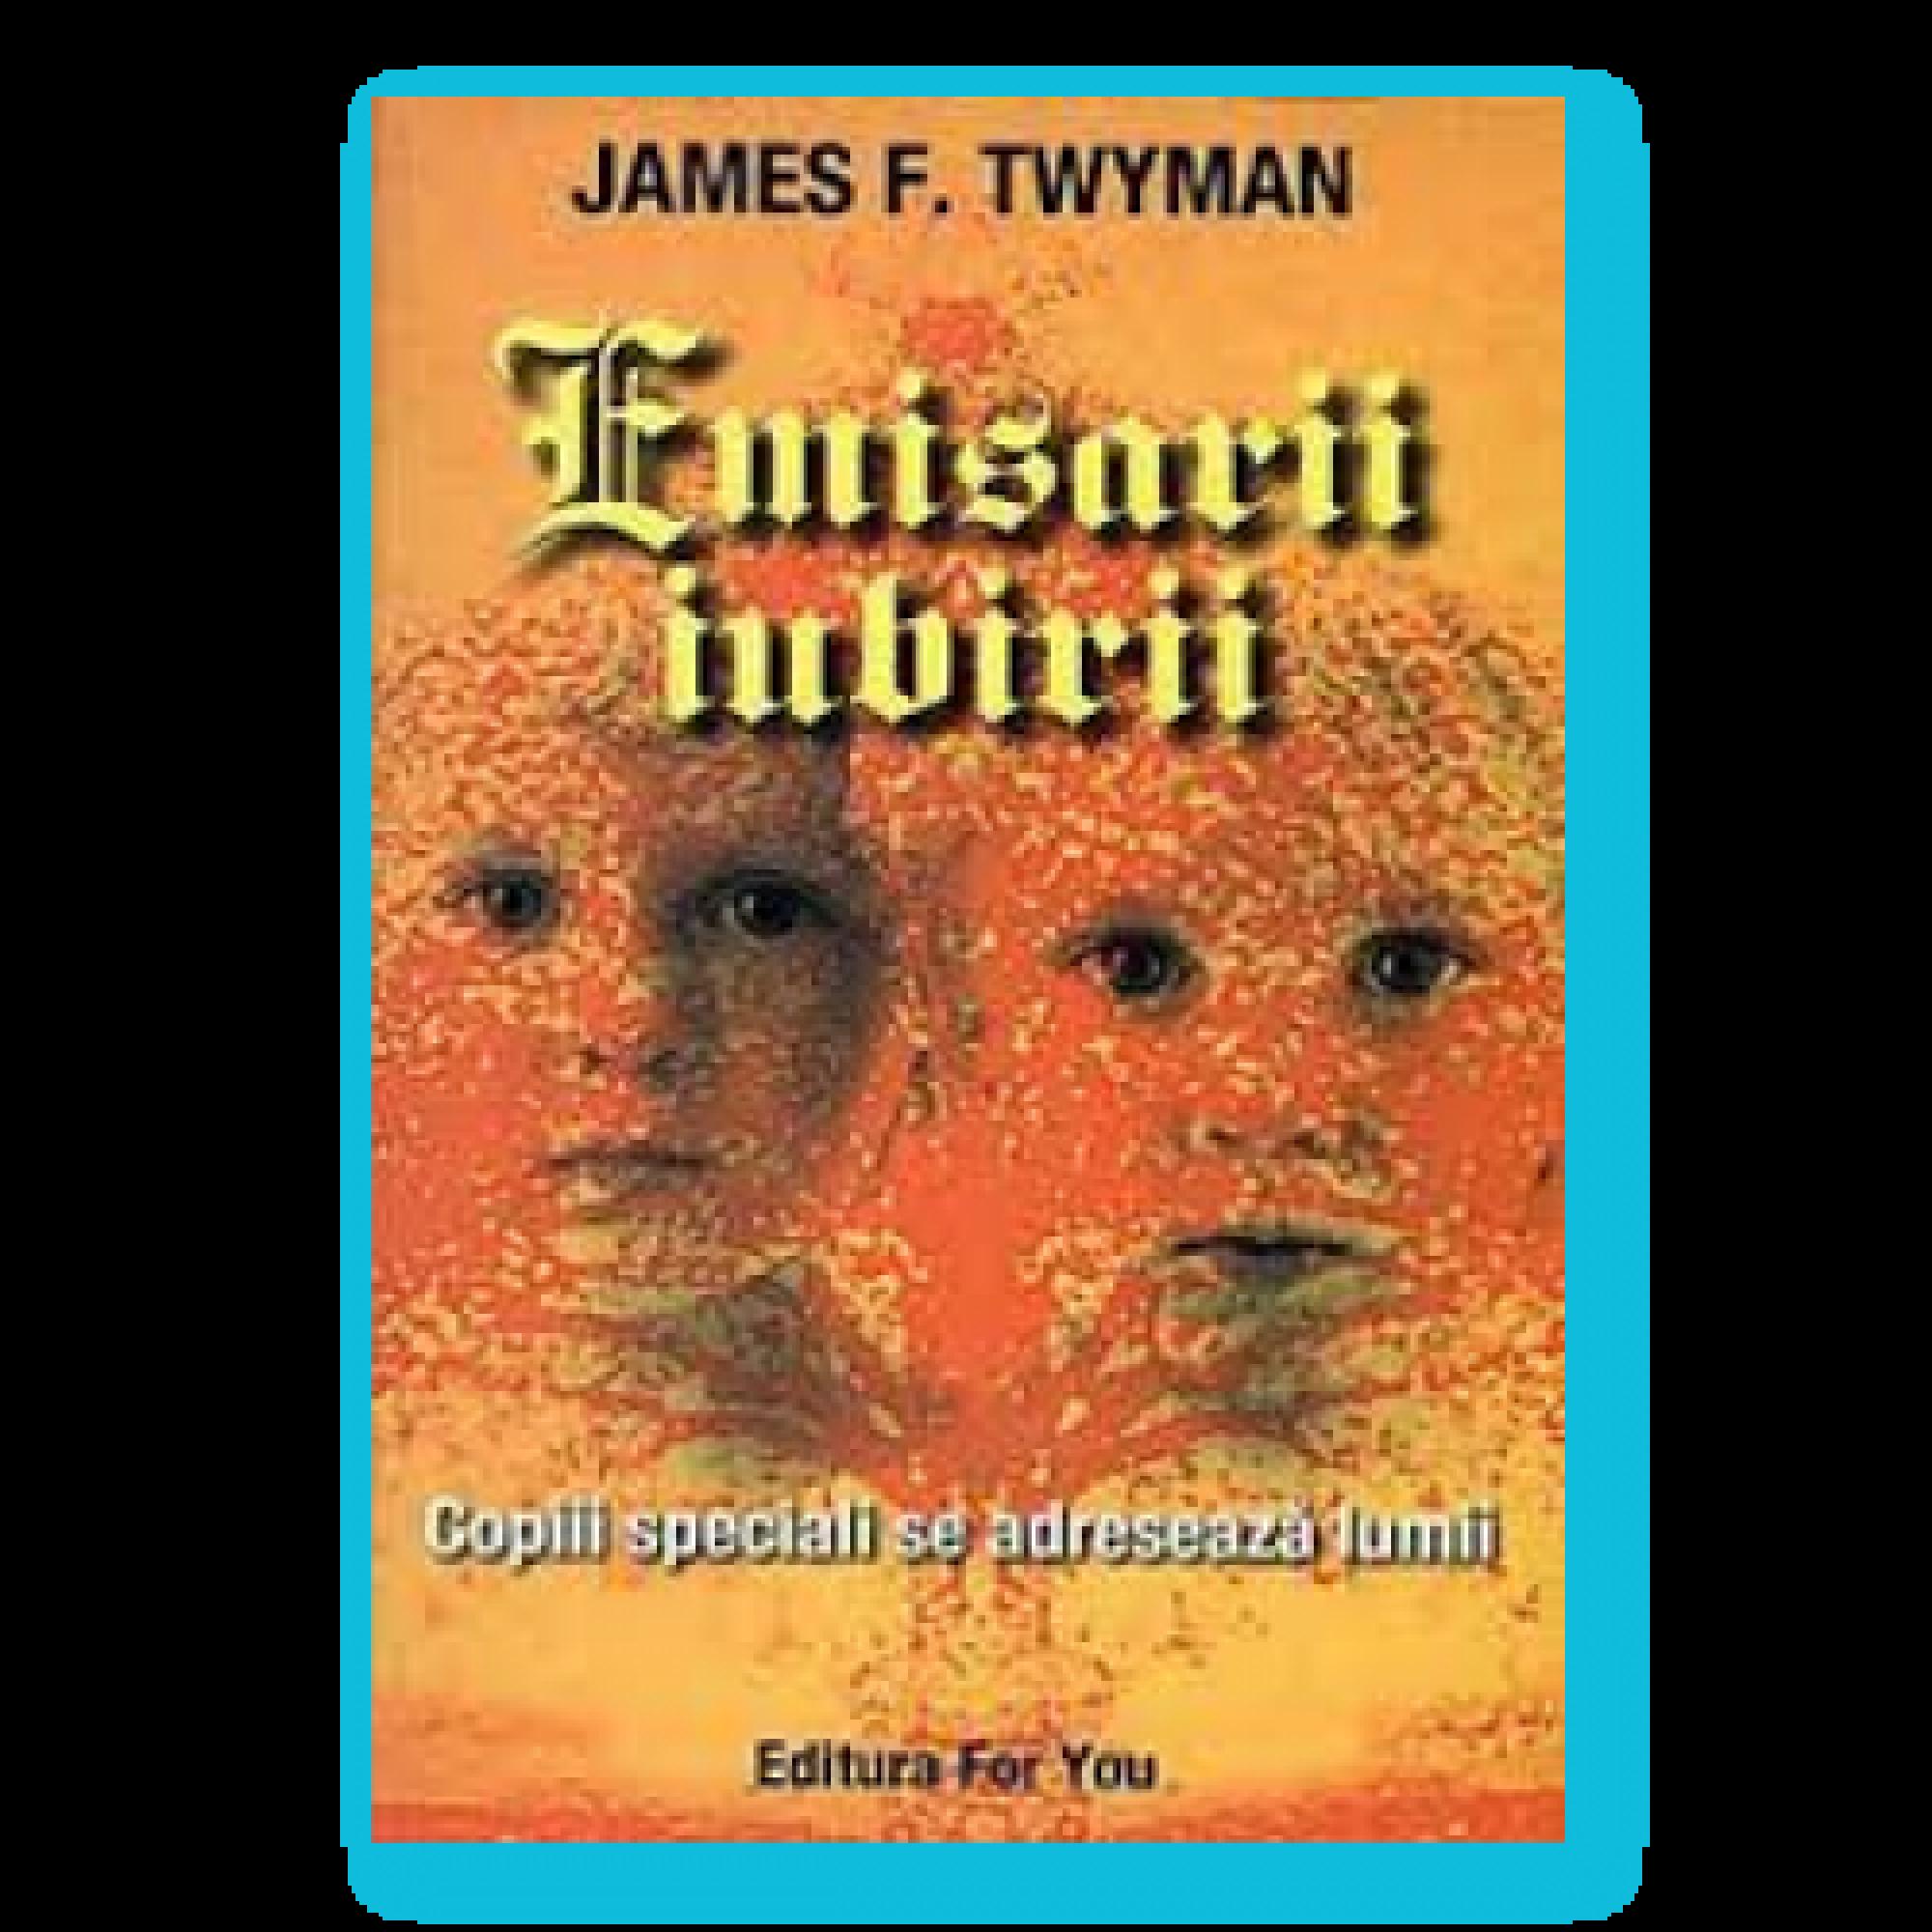 Emisarii iubirii. Copiii speciali se adresează lumii; James F.Twyman